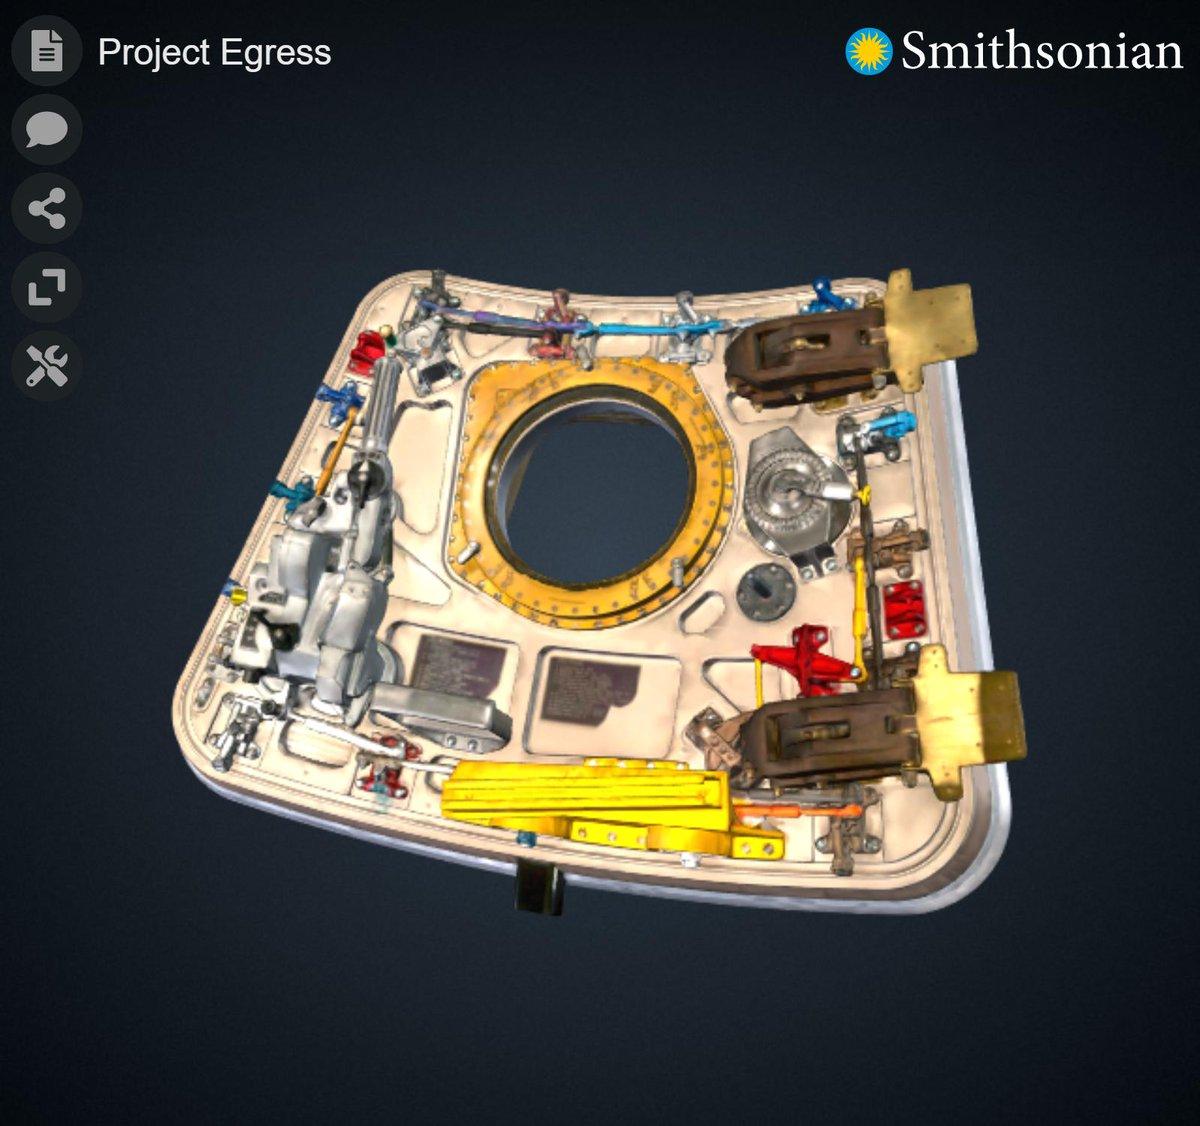 Smithsonian 3D on Twitter: